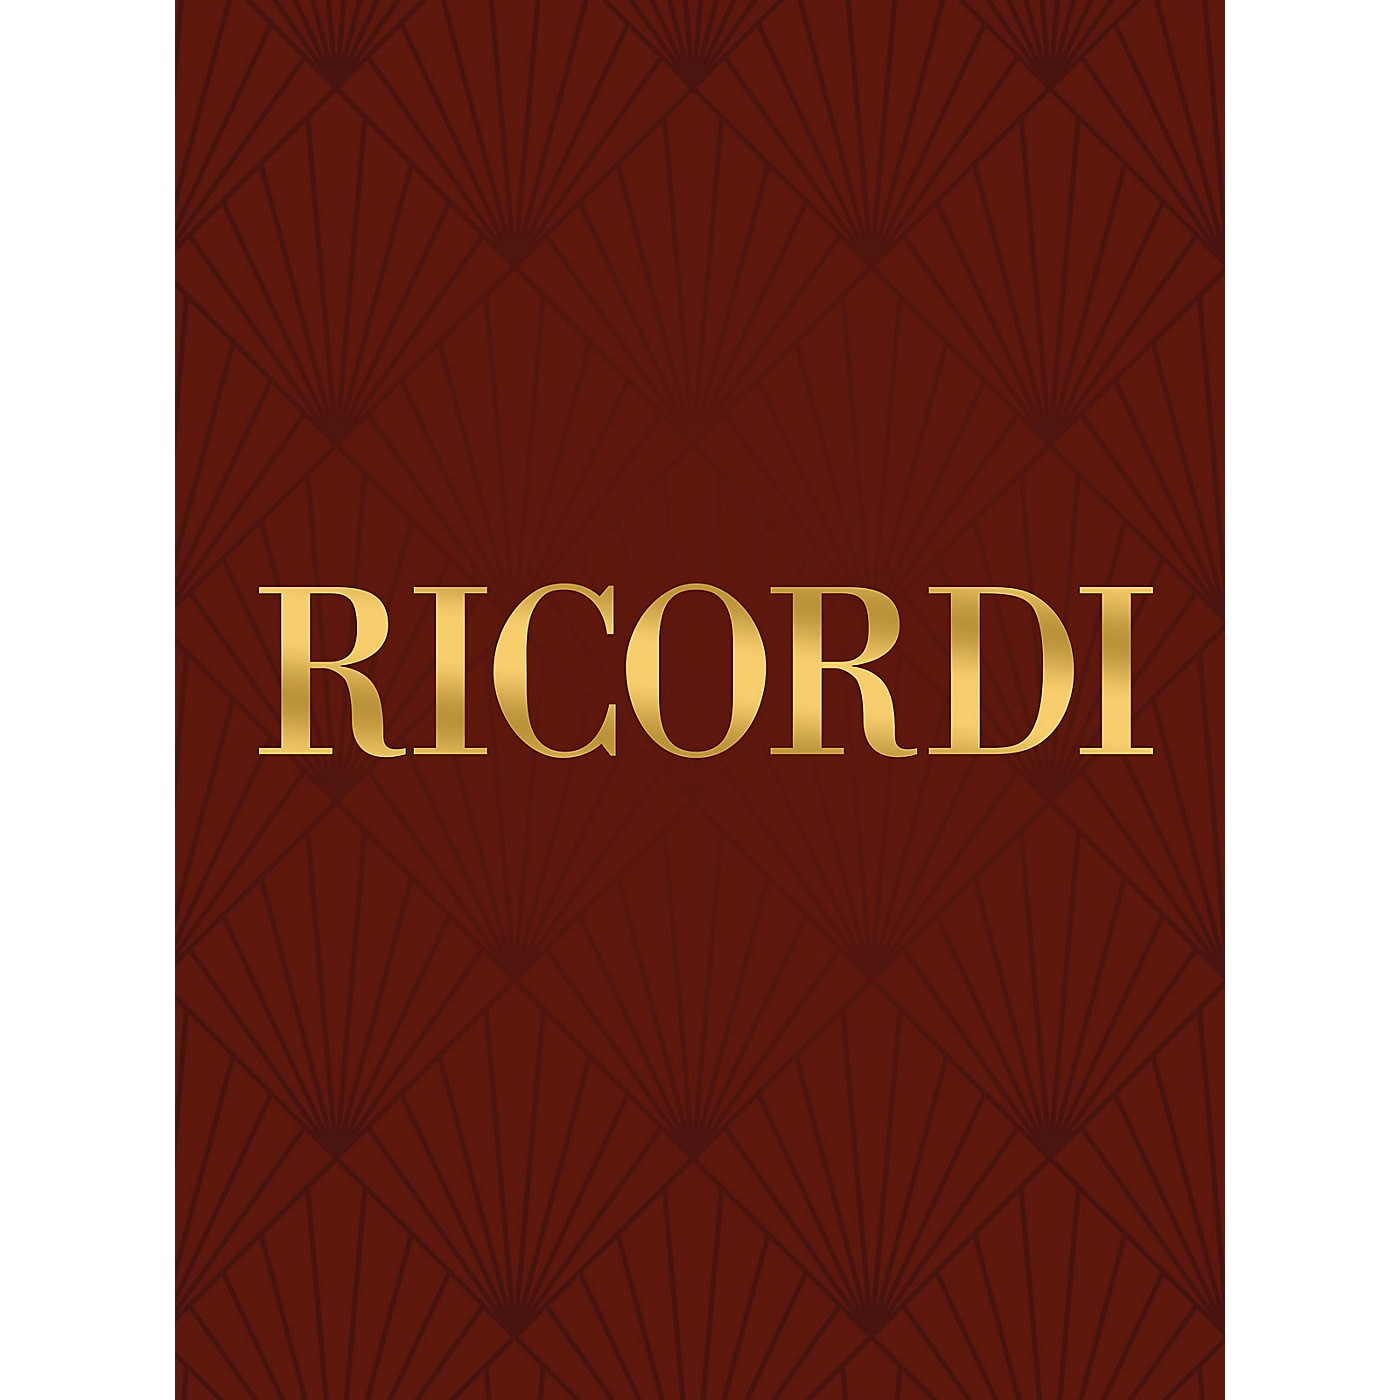 Ricordi Momento (Voice and Piano) Vocal Solo Series Composed by Elsa Olivieri Sangiacomo Respighi thumbnail